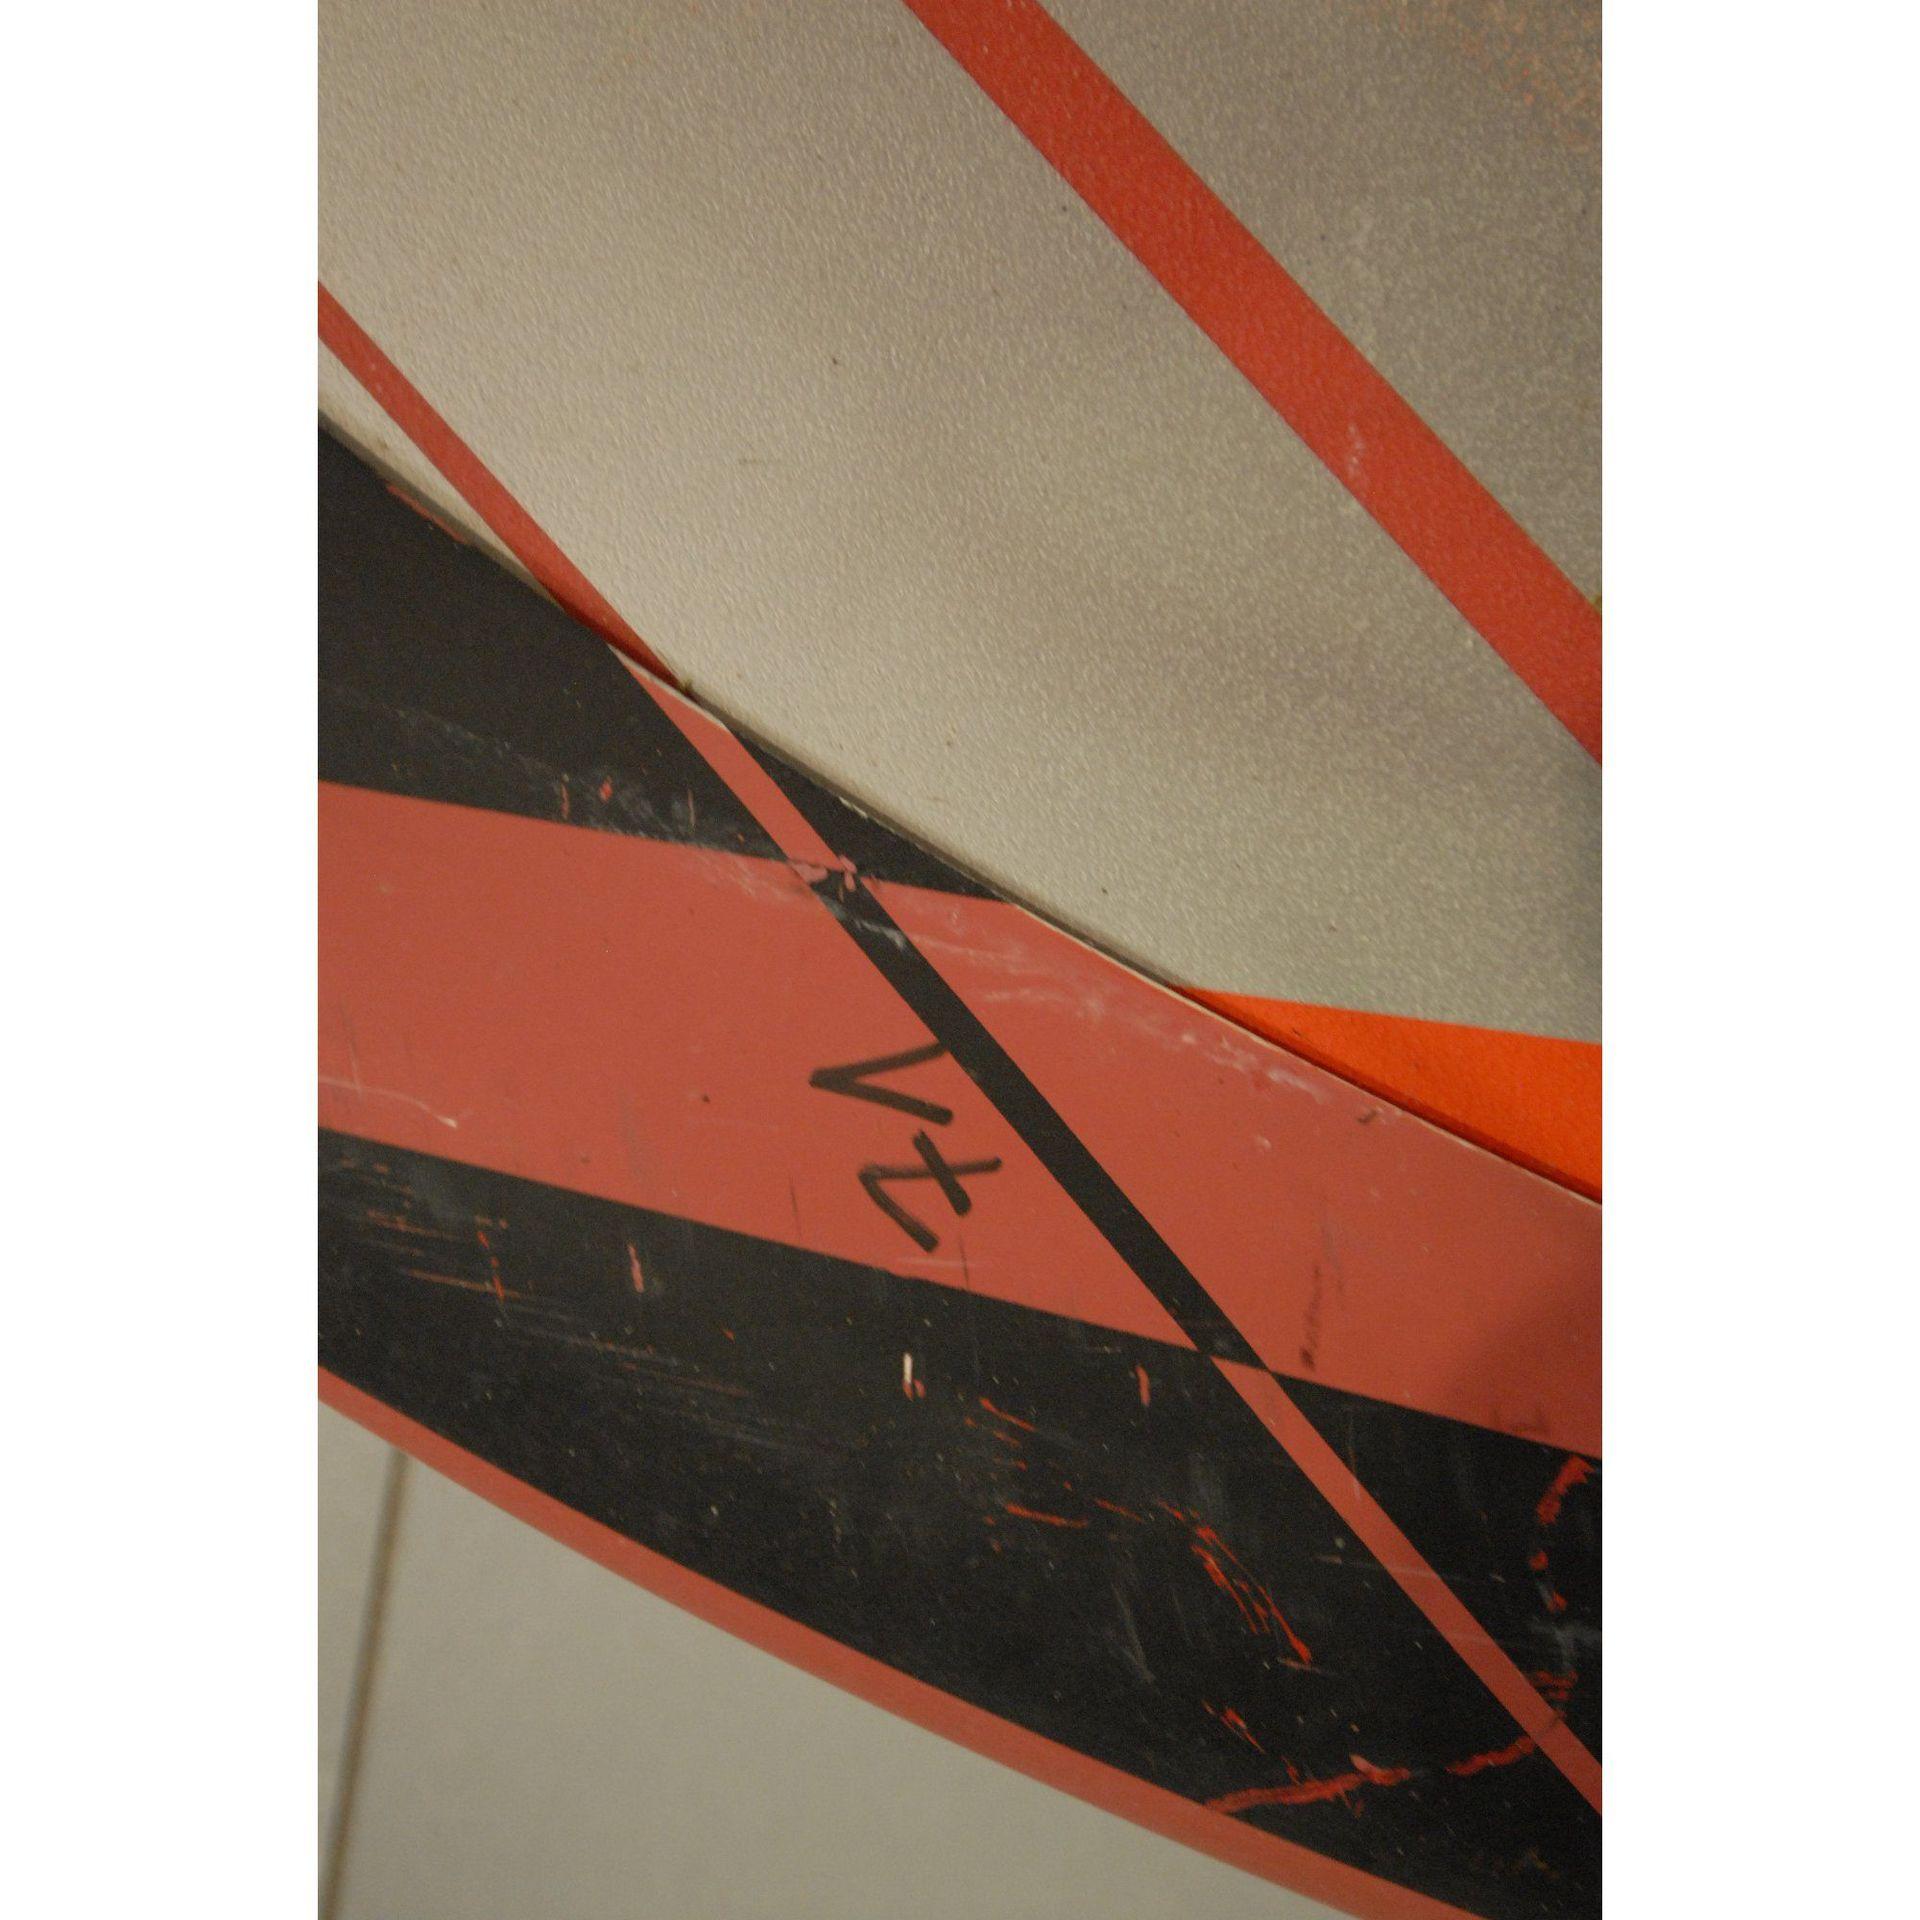 DESKA JP MAGIC RIDE FWS  104 - UŻYWANA FREERIDE (1711108) 3